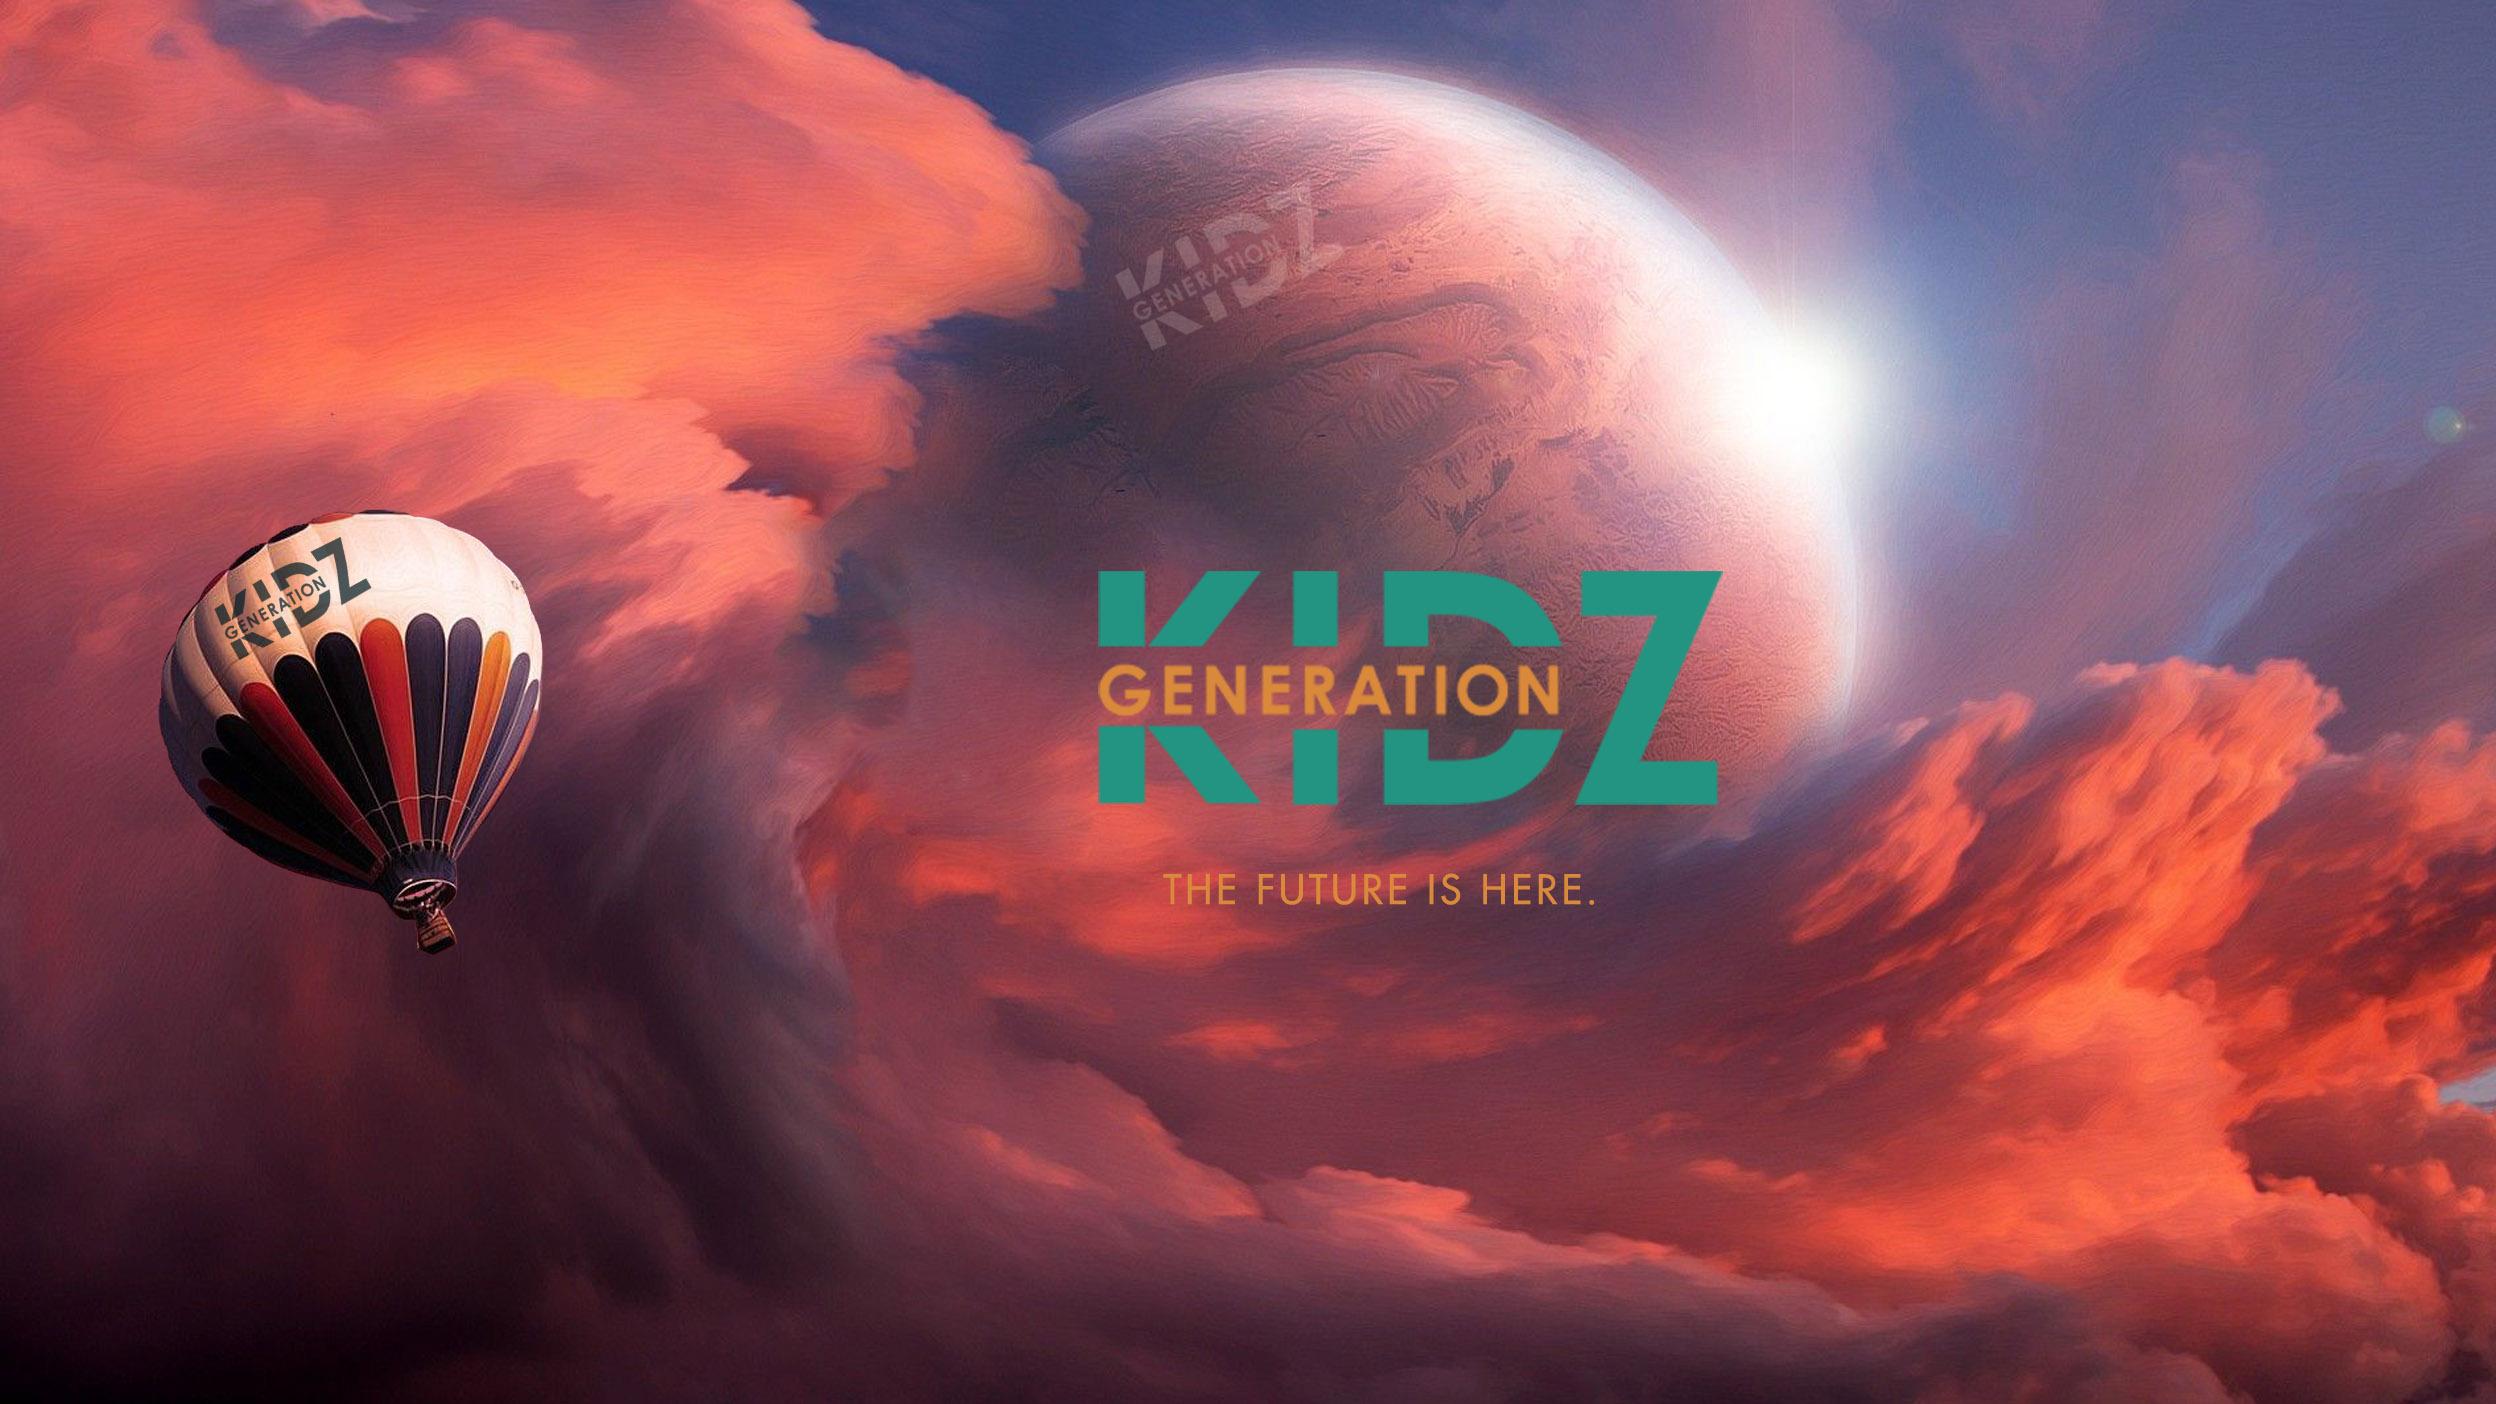 Kidz Generation Headers 7.jpg